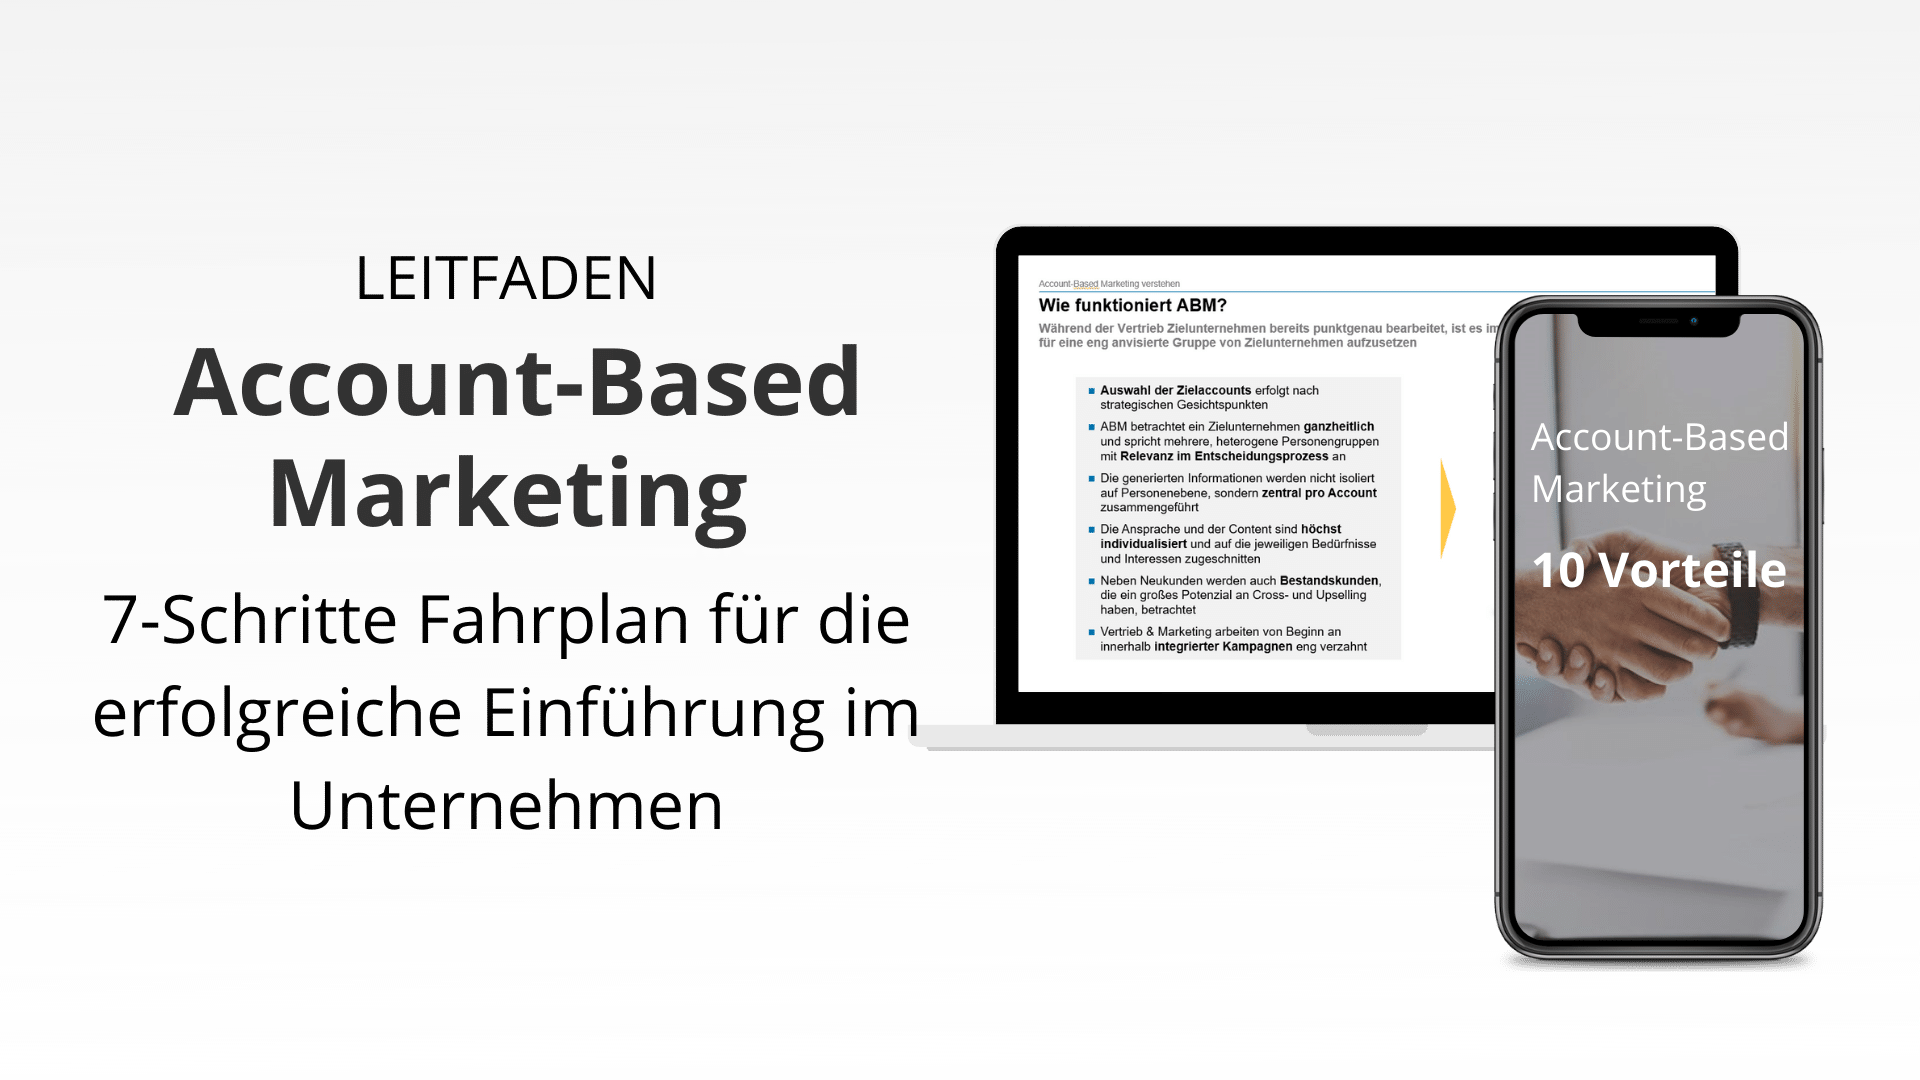 leitfaden-salessation-abm-7-schritte-fahrplan